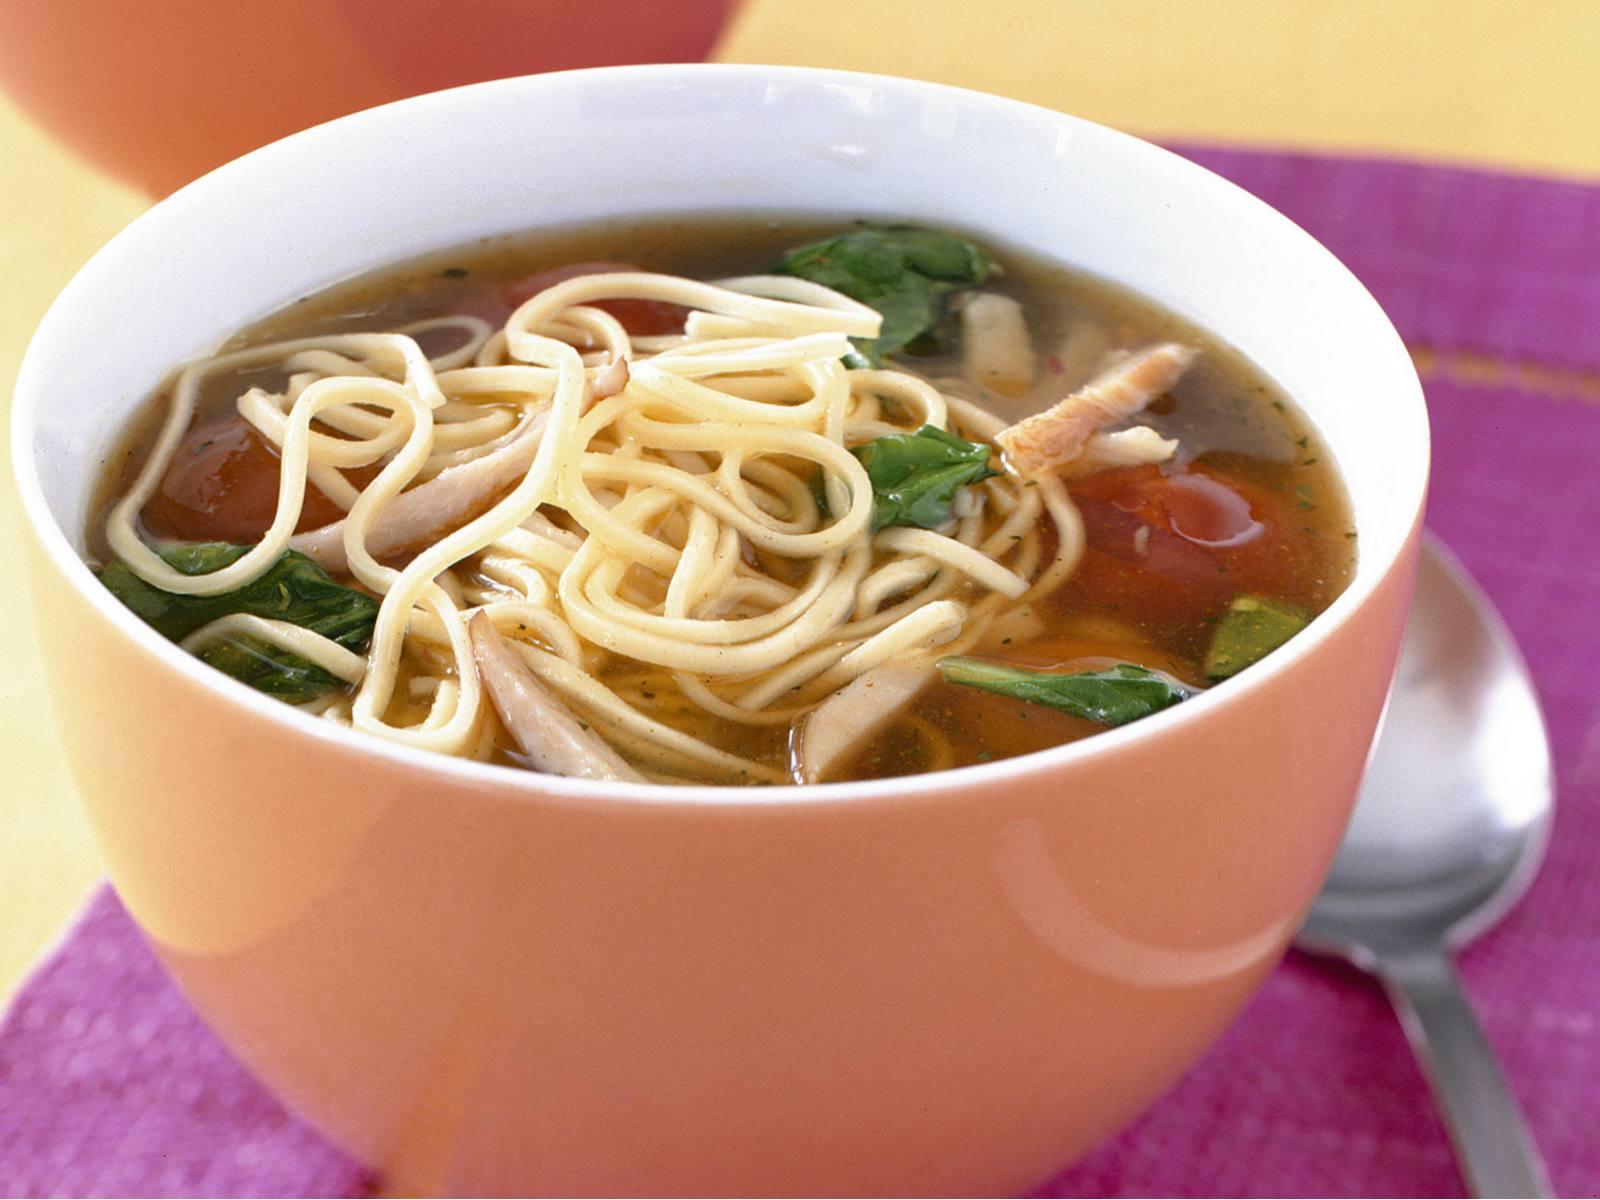 Noedelsoep met tomaat en spinazie